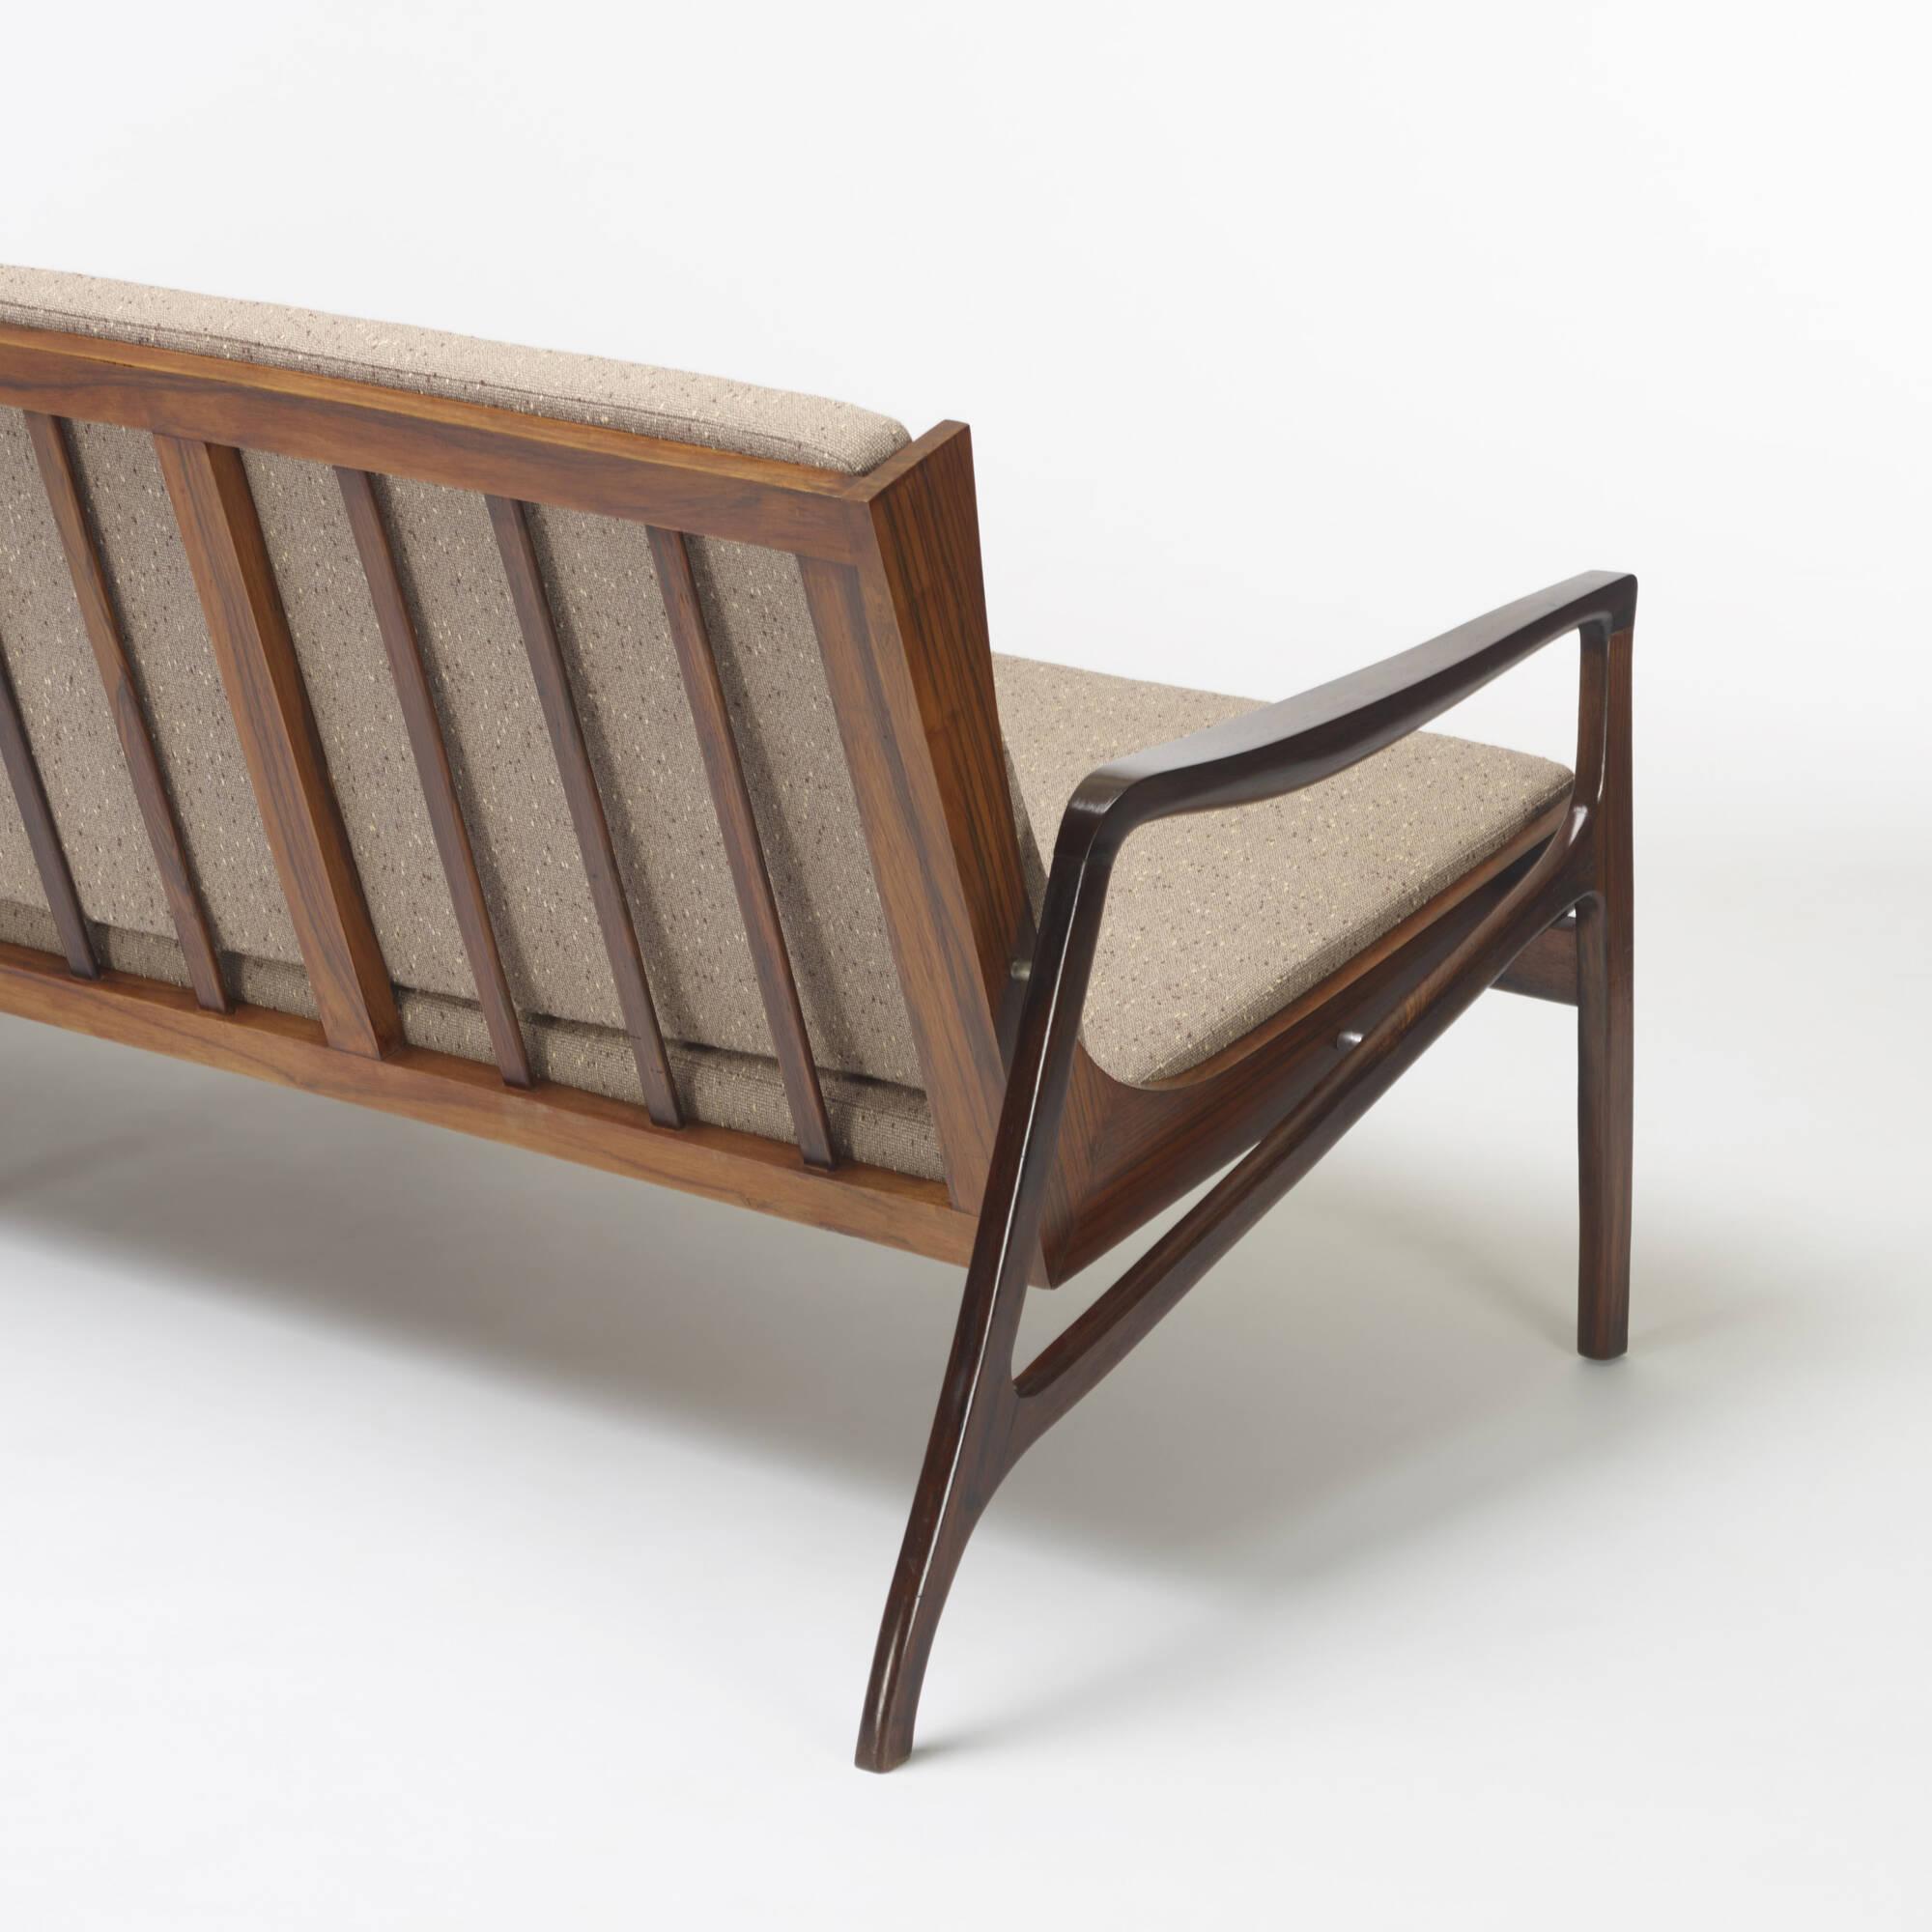 181: Brazilian / sofa (3 of 3)